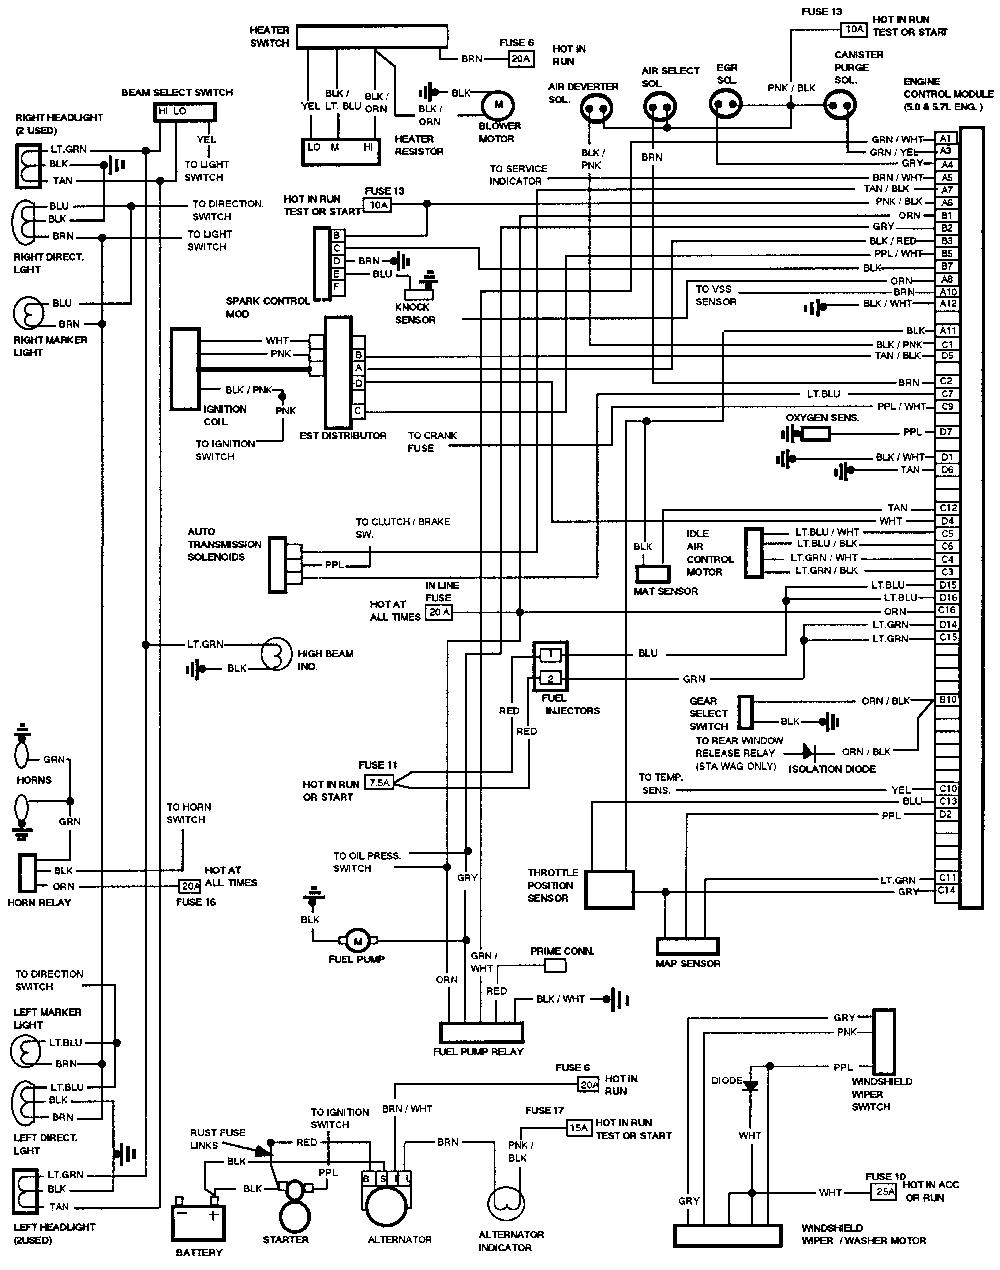 hight resolution of  4l60e pinout diagram on cd4e wiring diagram turbo 400 wiring diagram 5r55s wiring diagram